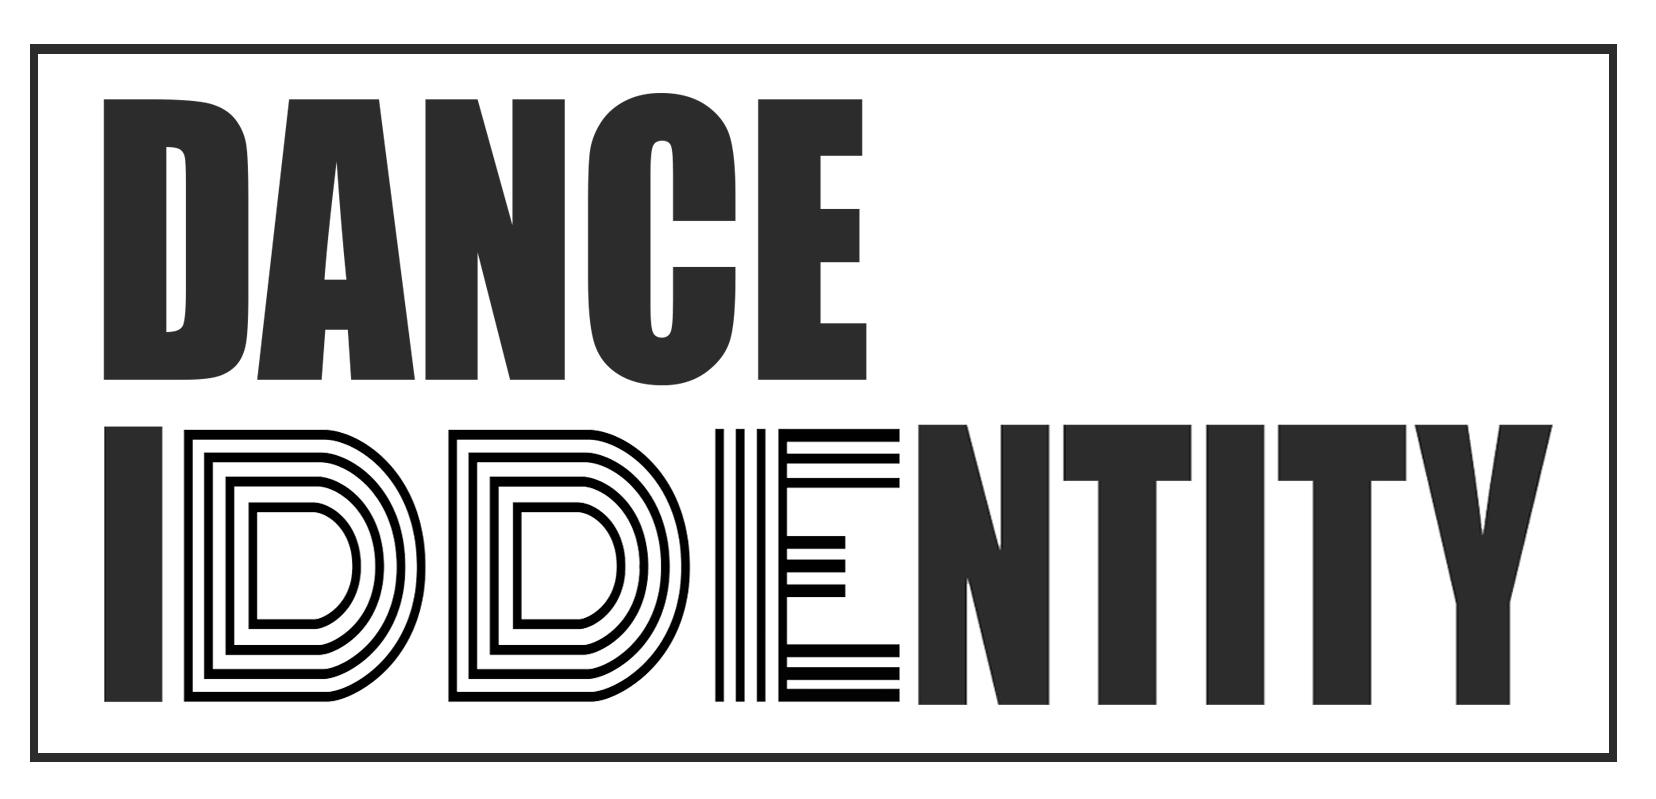 iDDEntity